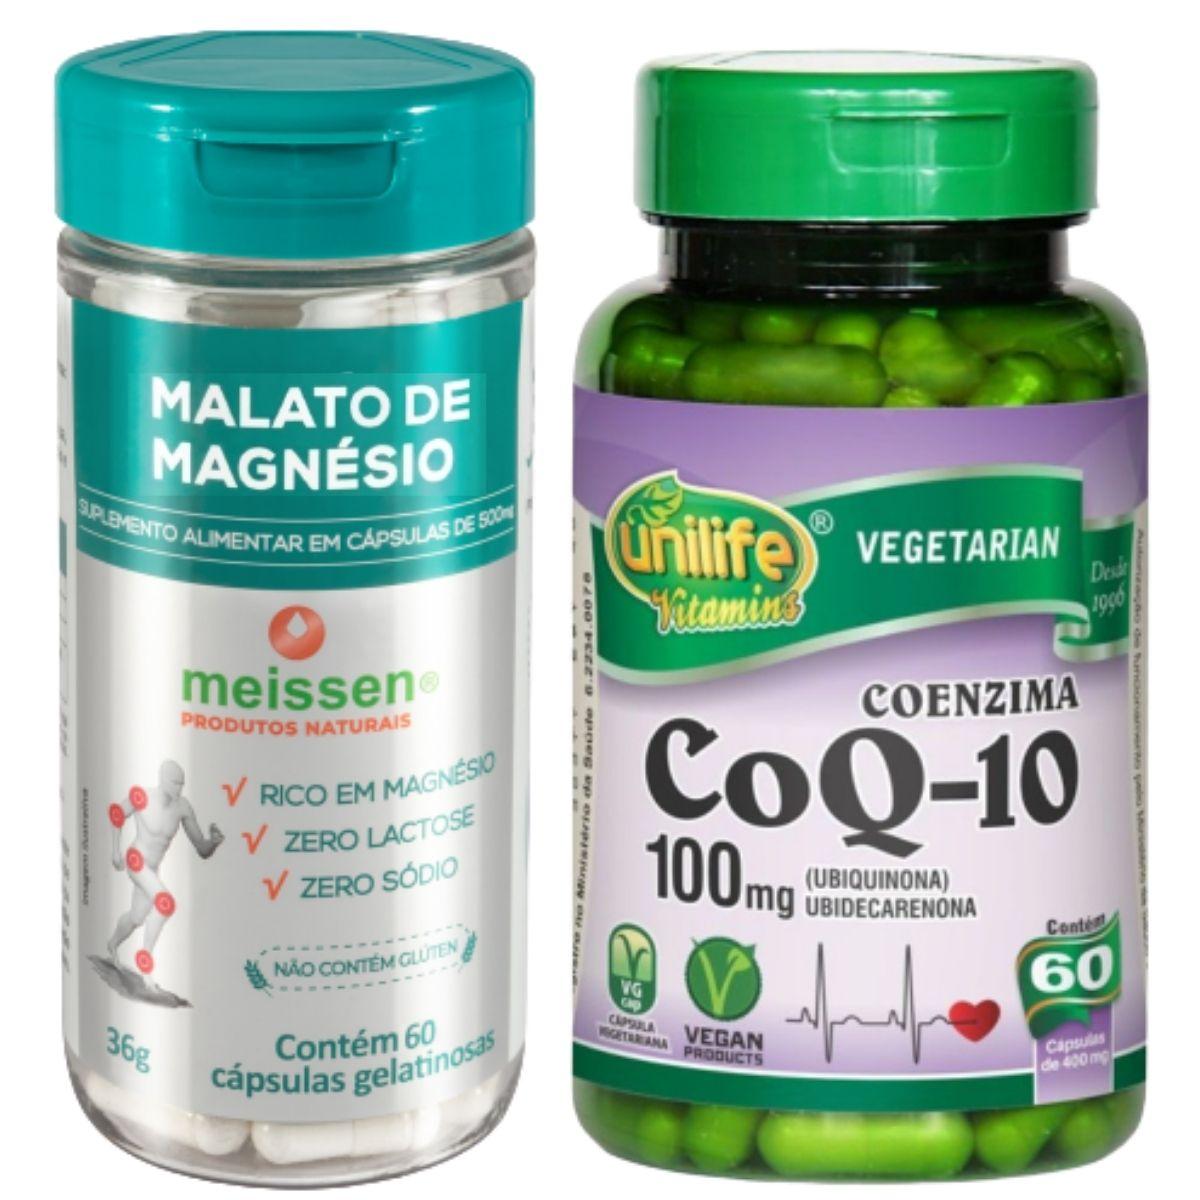 1 Coenzima Q10 100 Mg 60 Cápsulas Unilife + 1 Malato de Magnésio 60 Cápsulas- Meissen